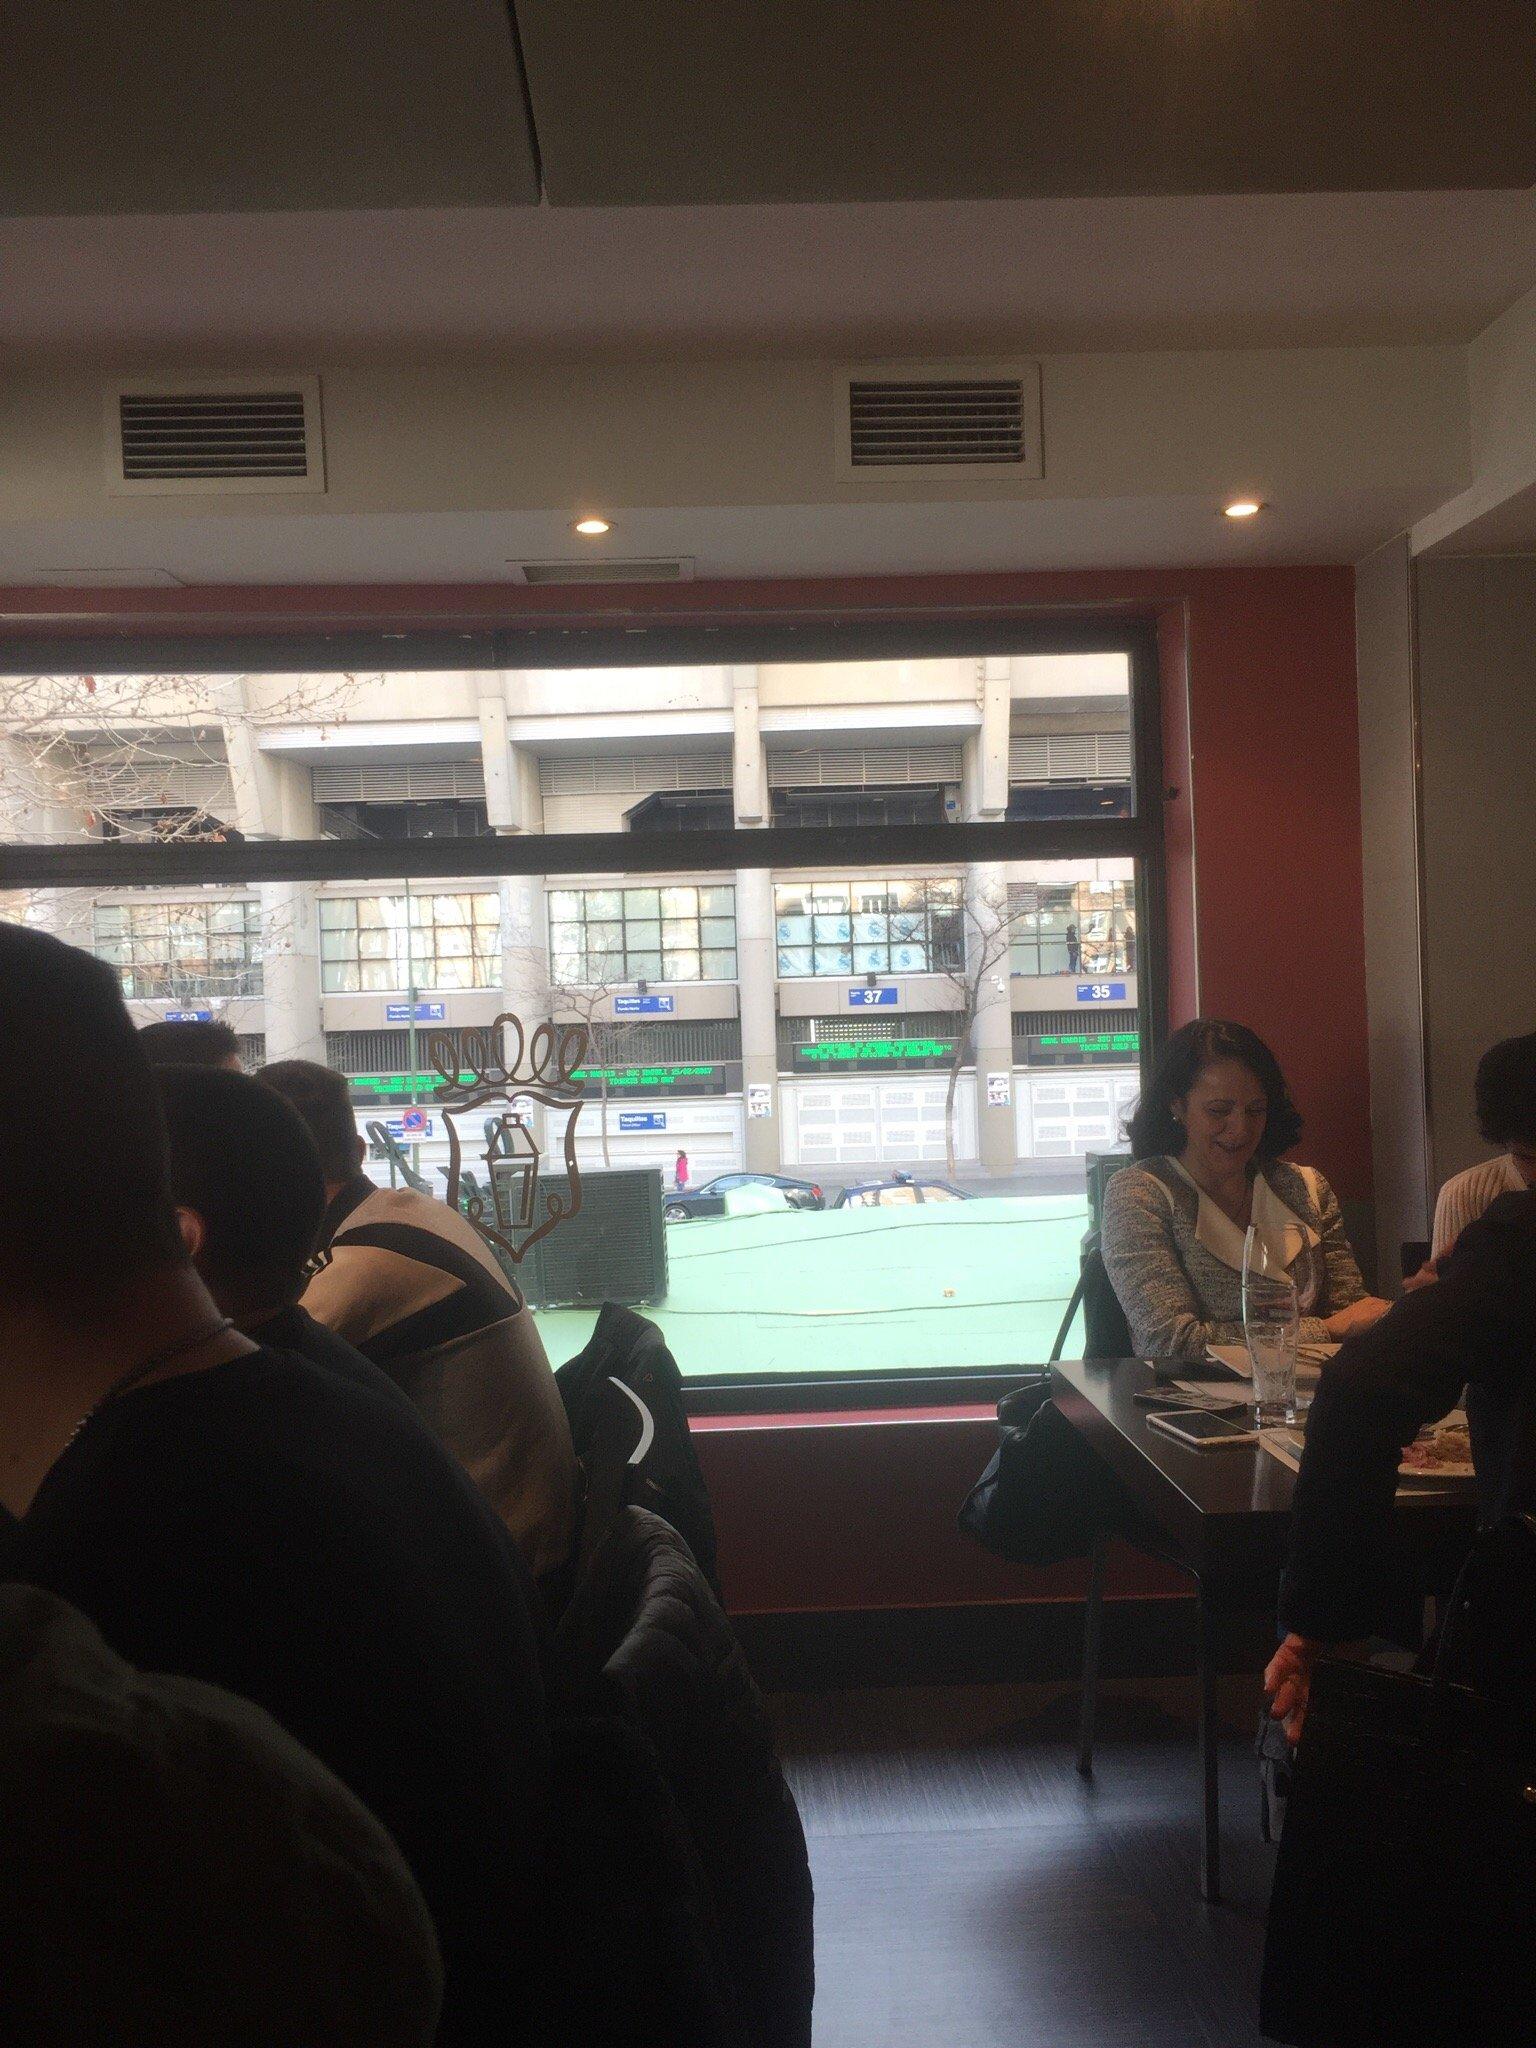 Jose luis madrid calle rafael salgado 11 restaurant - Calle rafael salgado ...